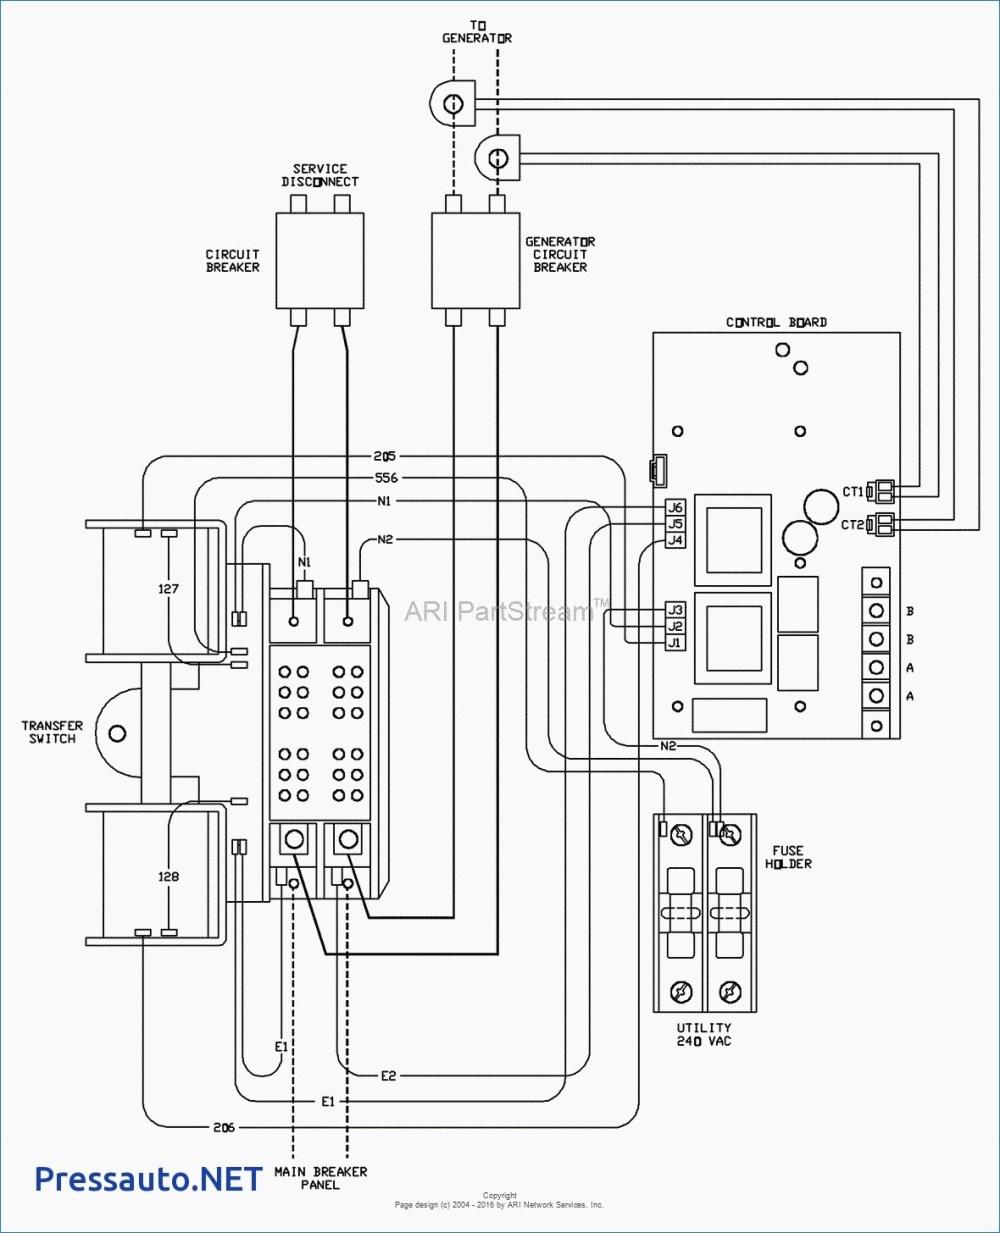 medium resolution of reliance transfer switch wiring diagram